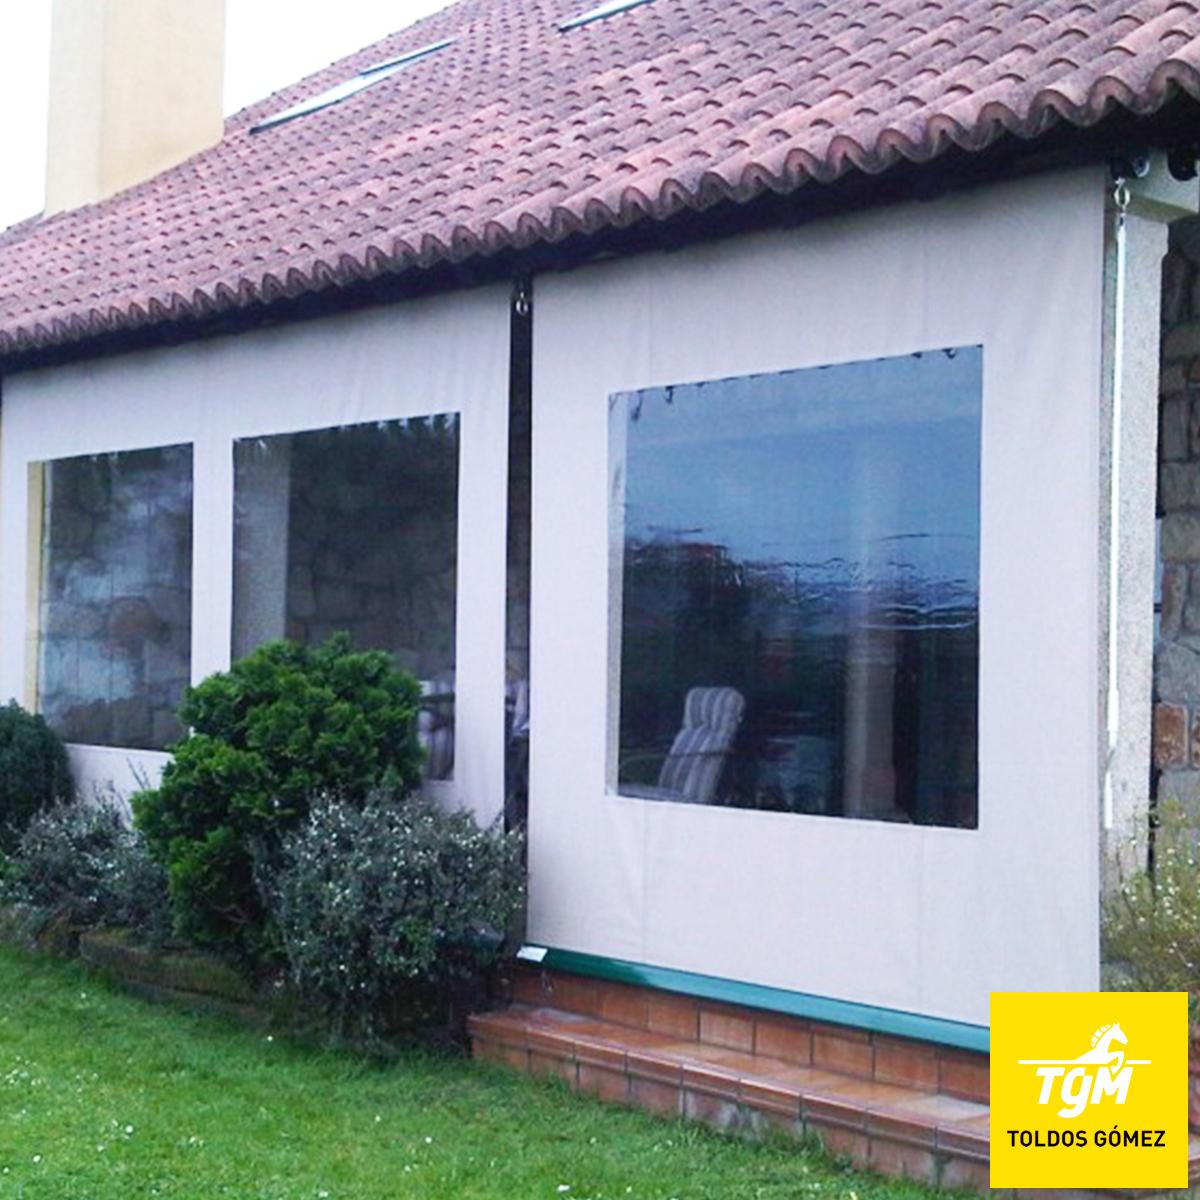 Porche blog for Toldo horizontal terraza